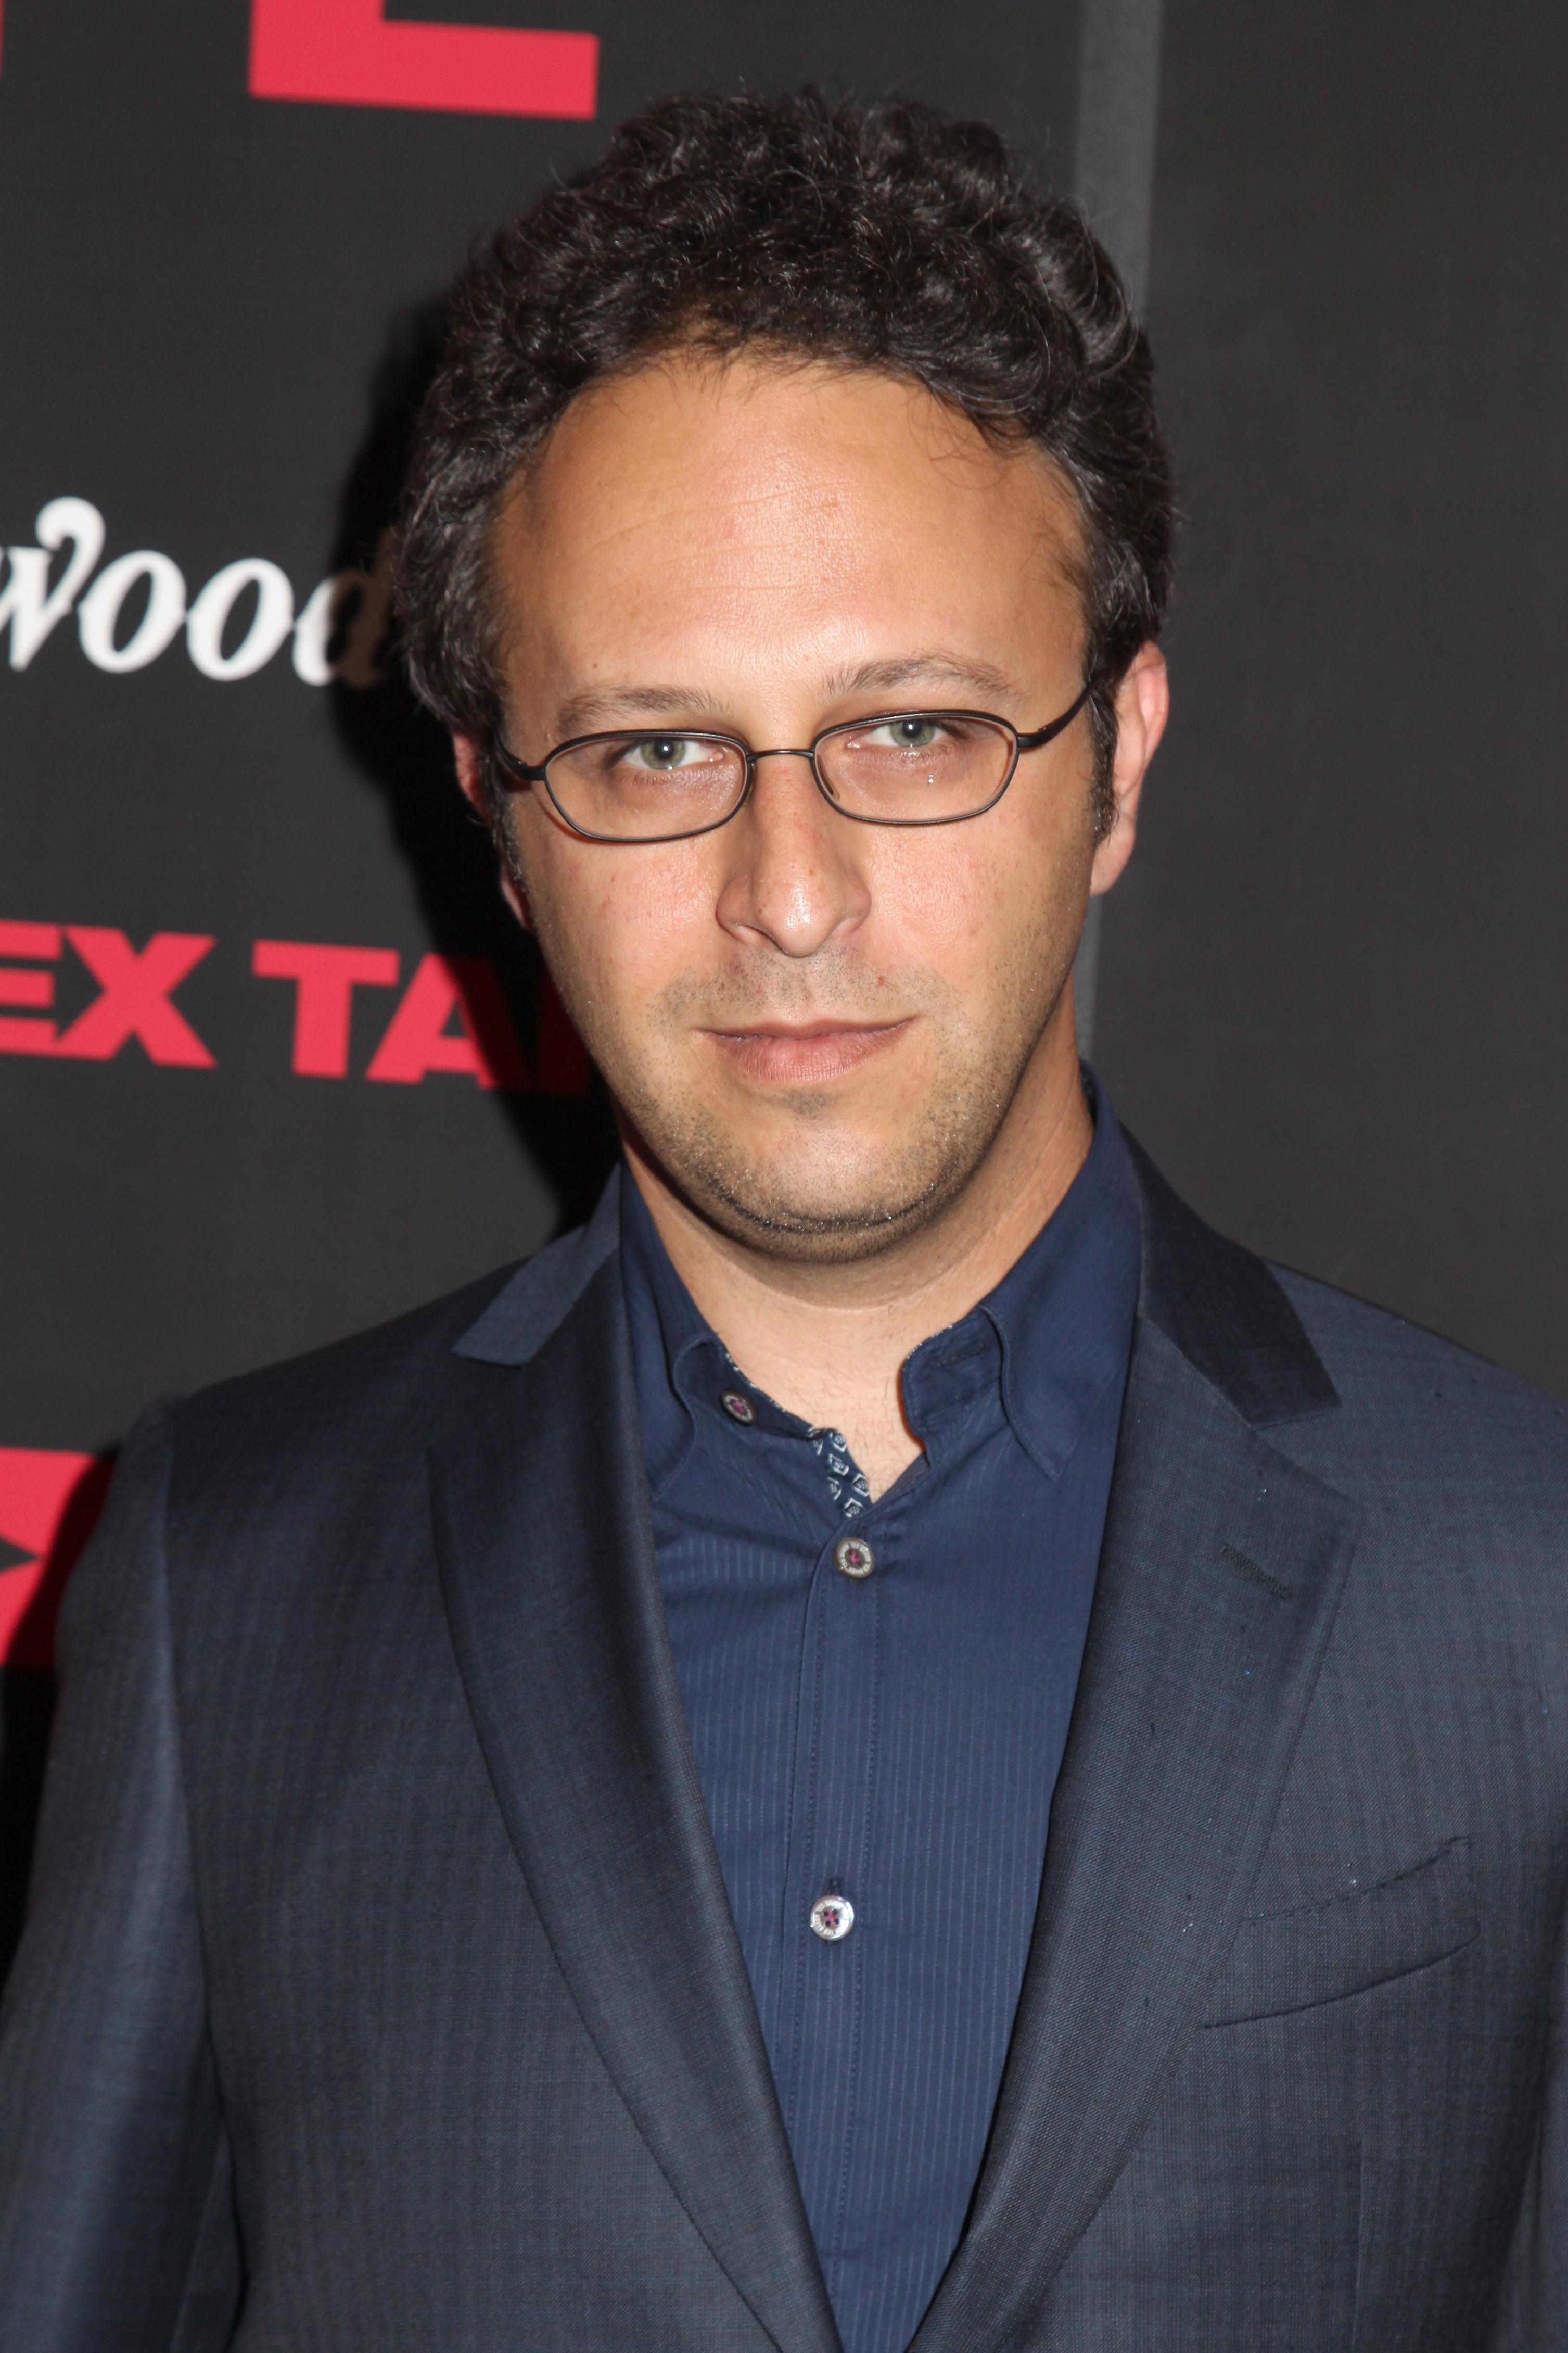 'Sex Tape' film premiere, New York, America - 14 Jul 2014